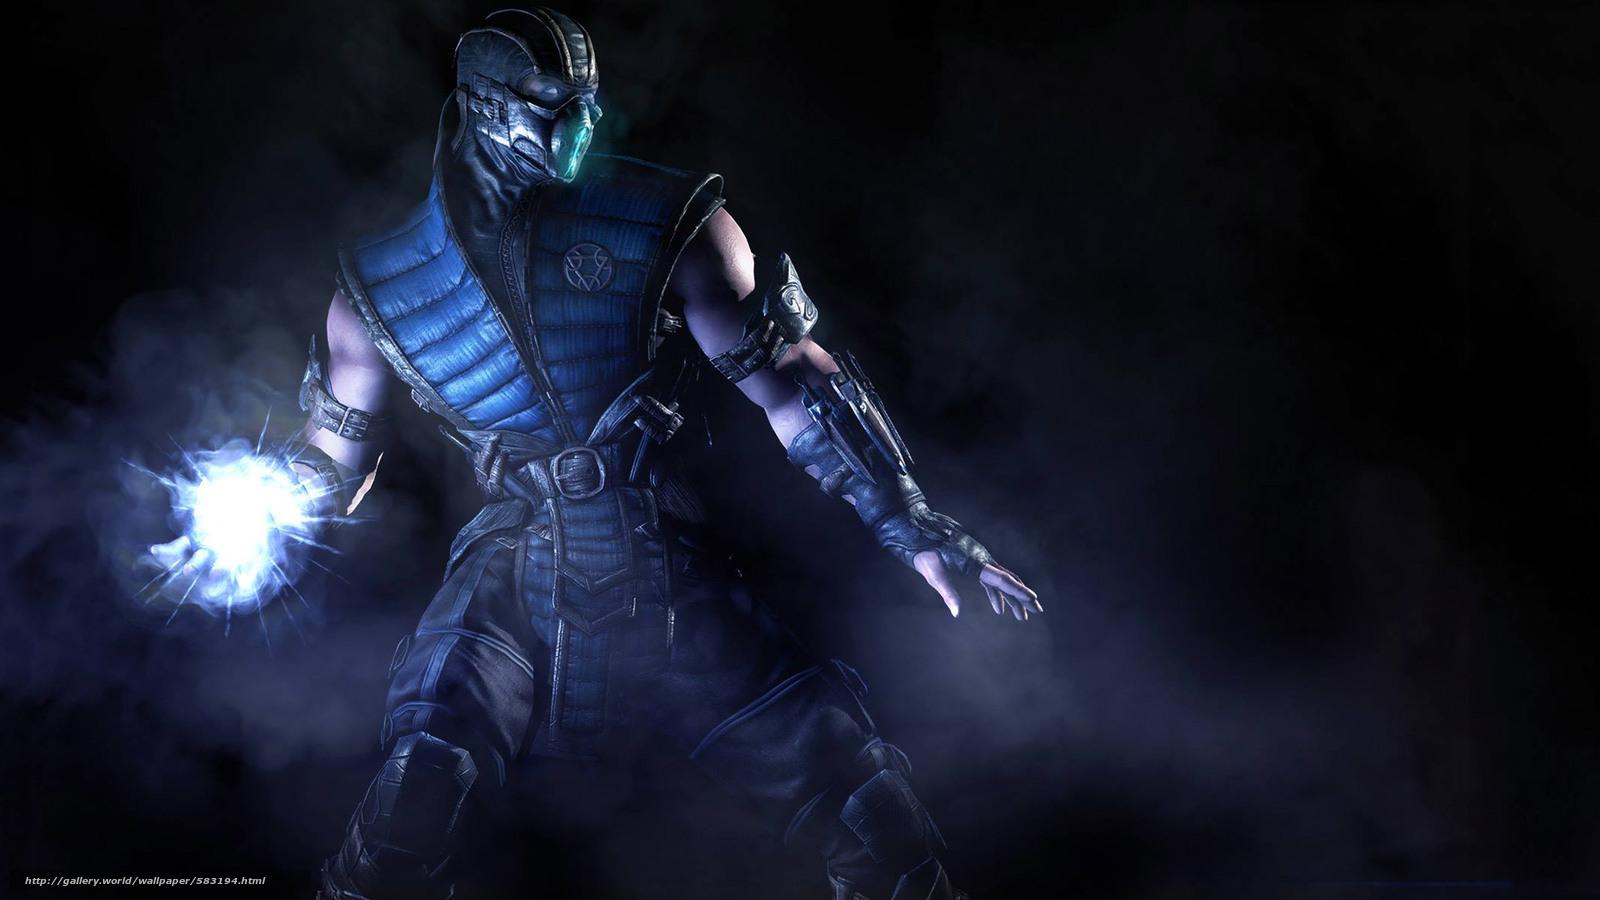 Download Wallpaper Scorpion Mortal Kombat Mortal Kombat X Games